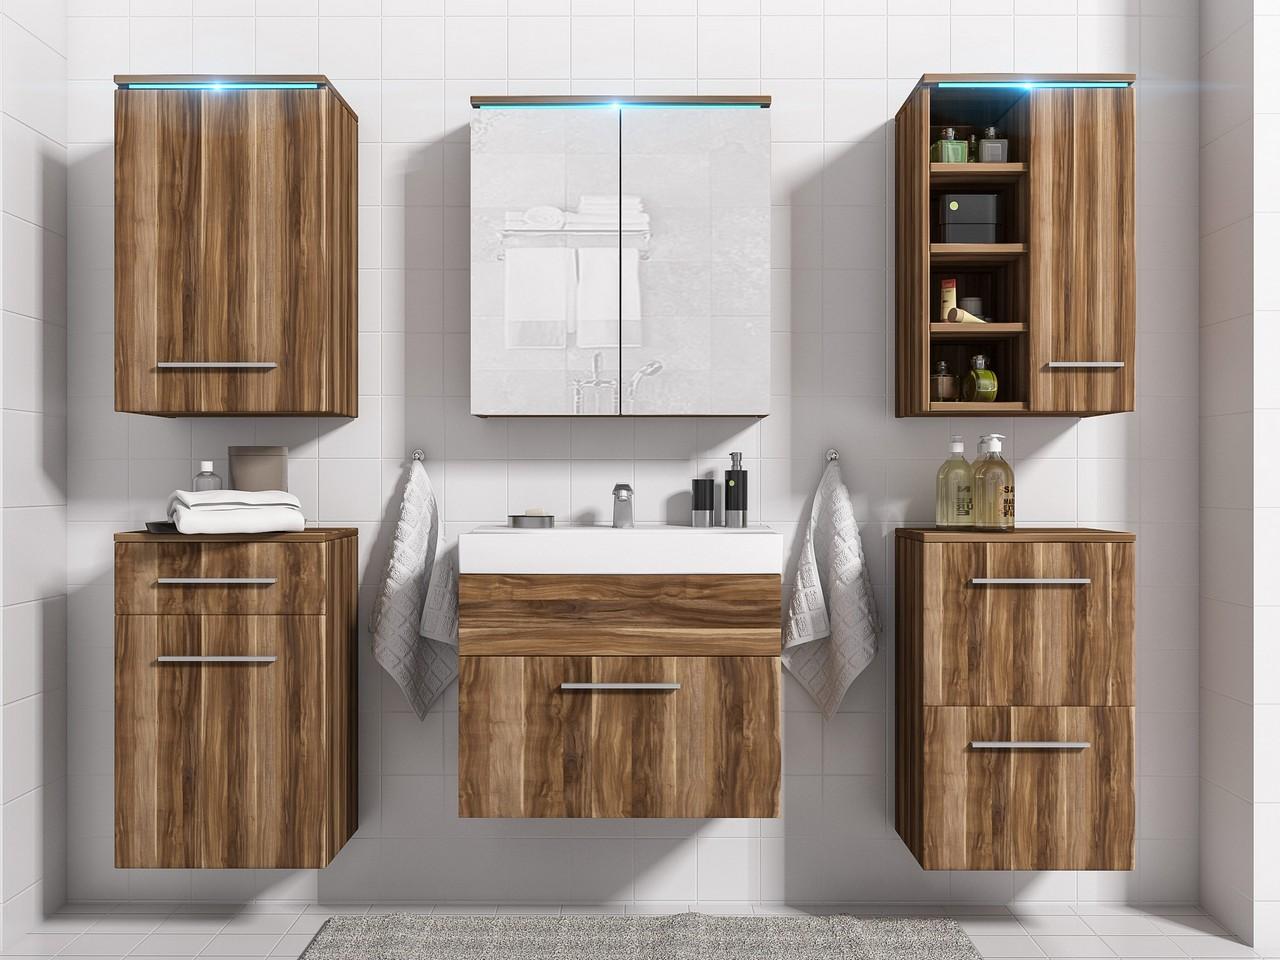 Luxusná kúpeľňa MEGI 7 Slivka/Slivka